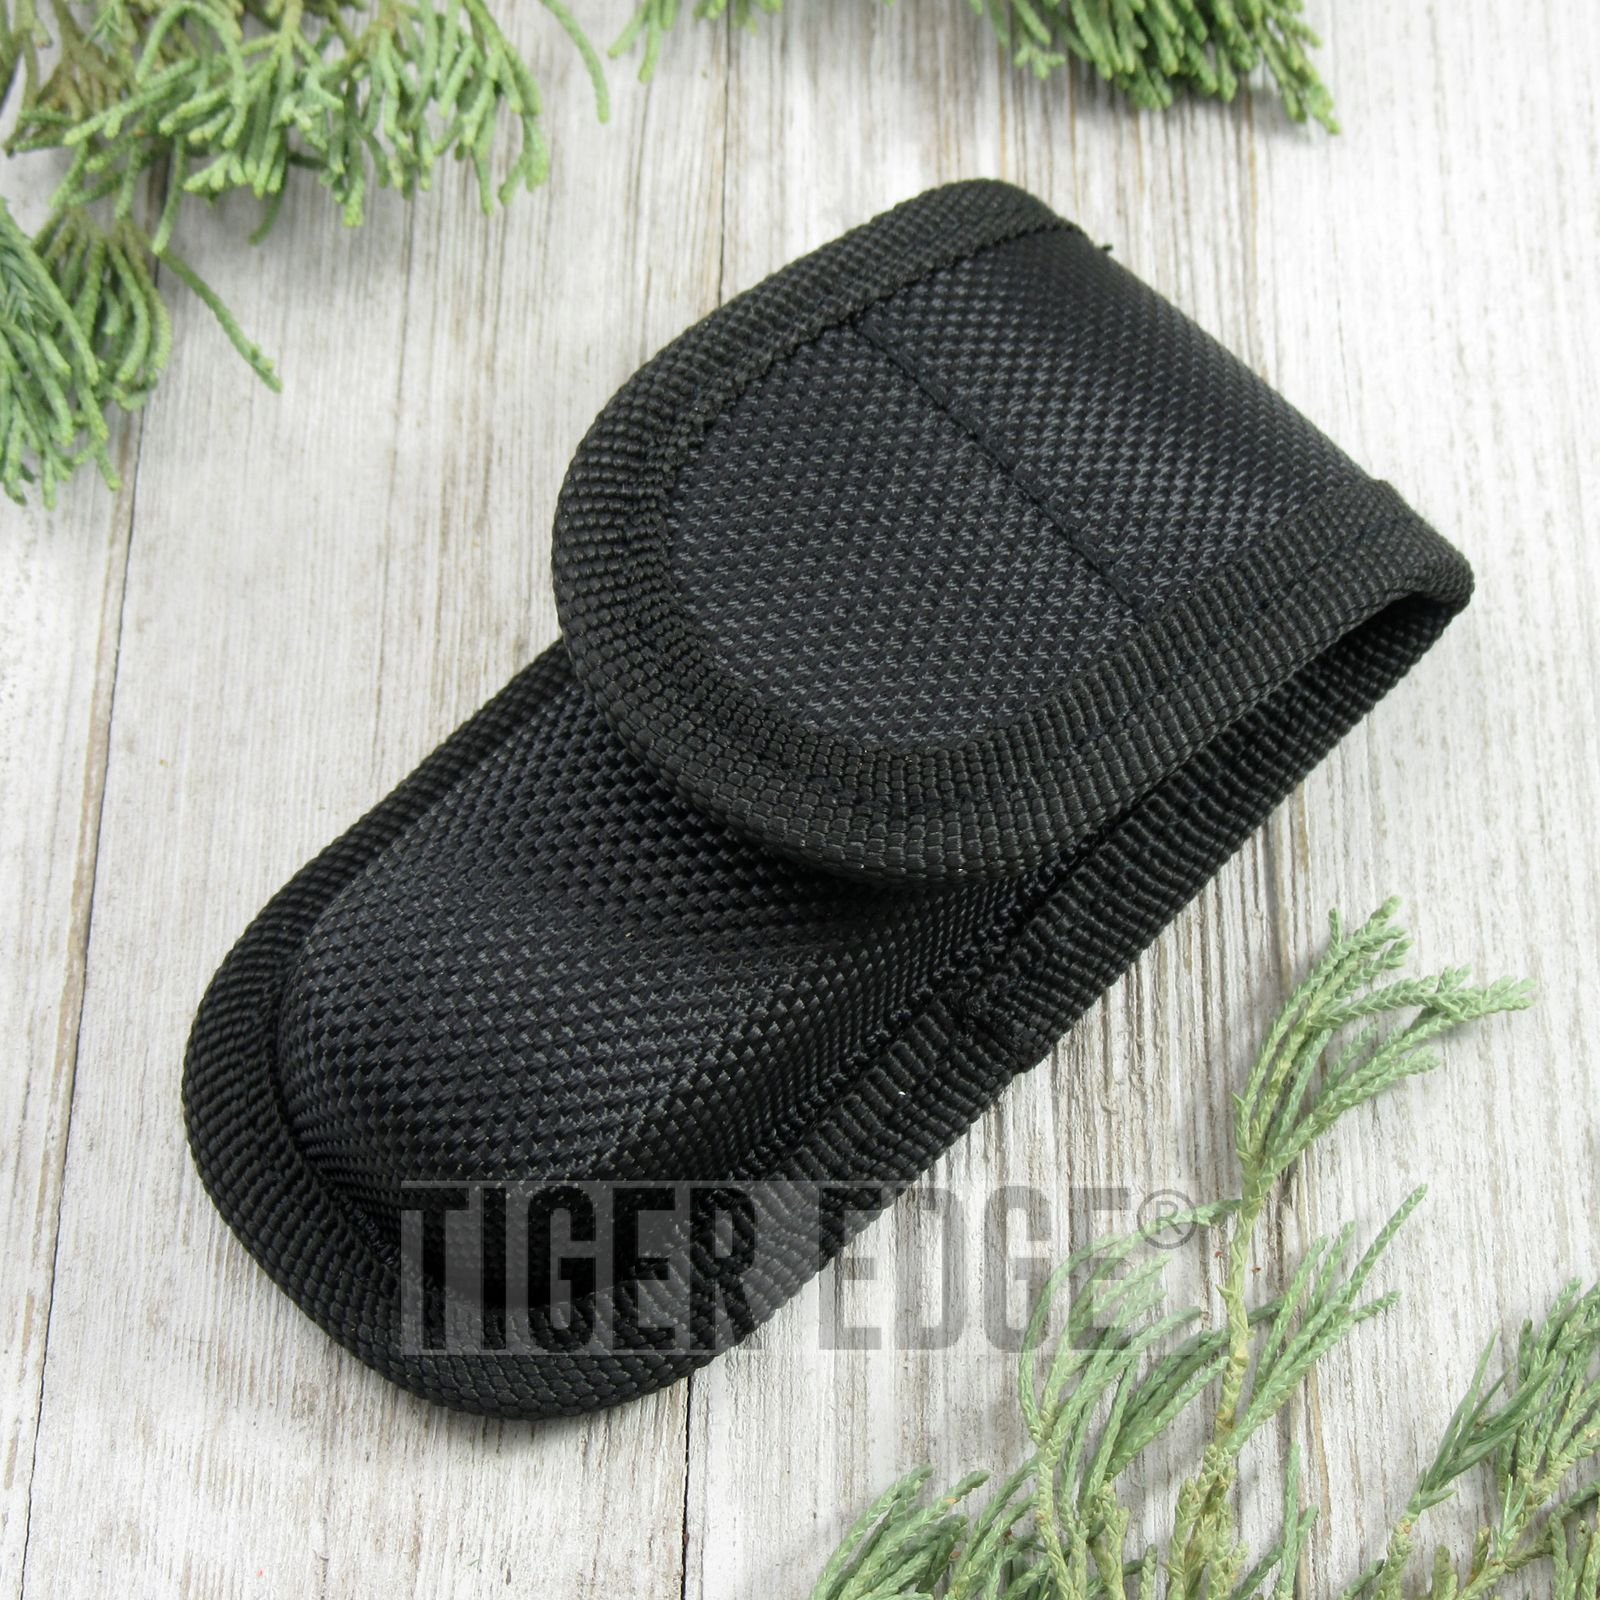 Folding Knife Sheath Hard Molded Tactical Black Nylon Case Pouch - Fits 3